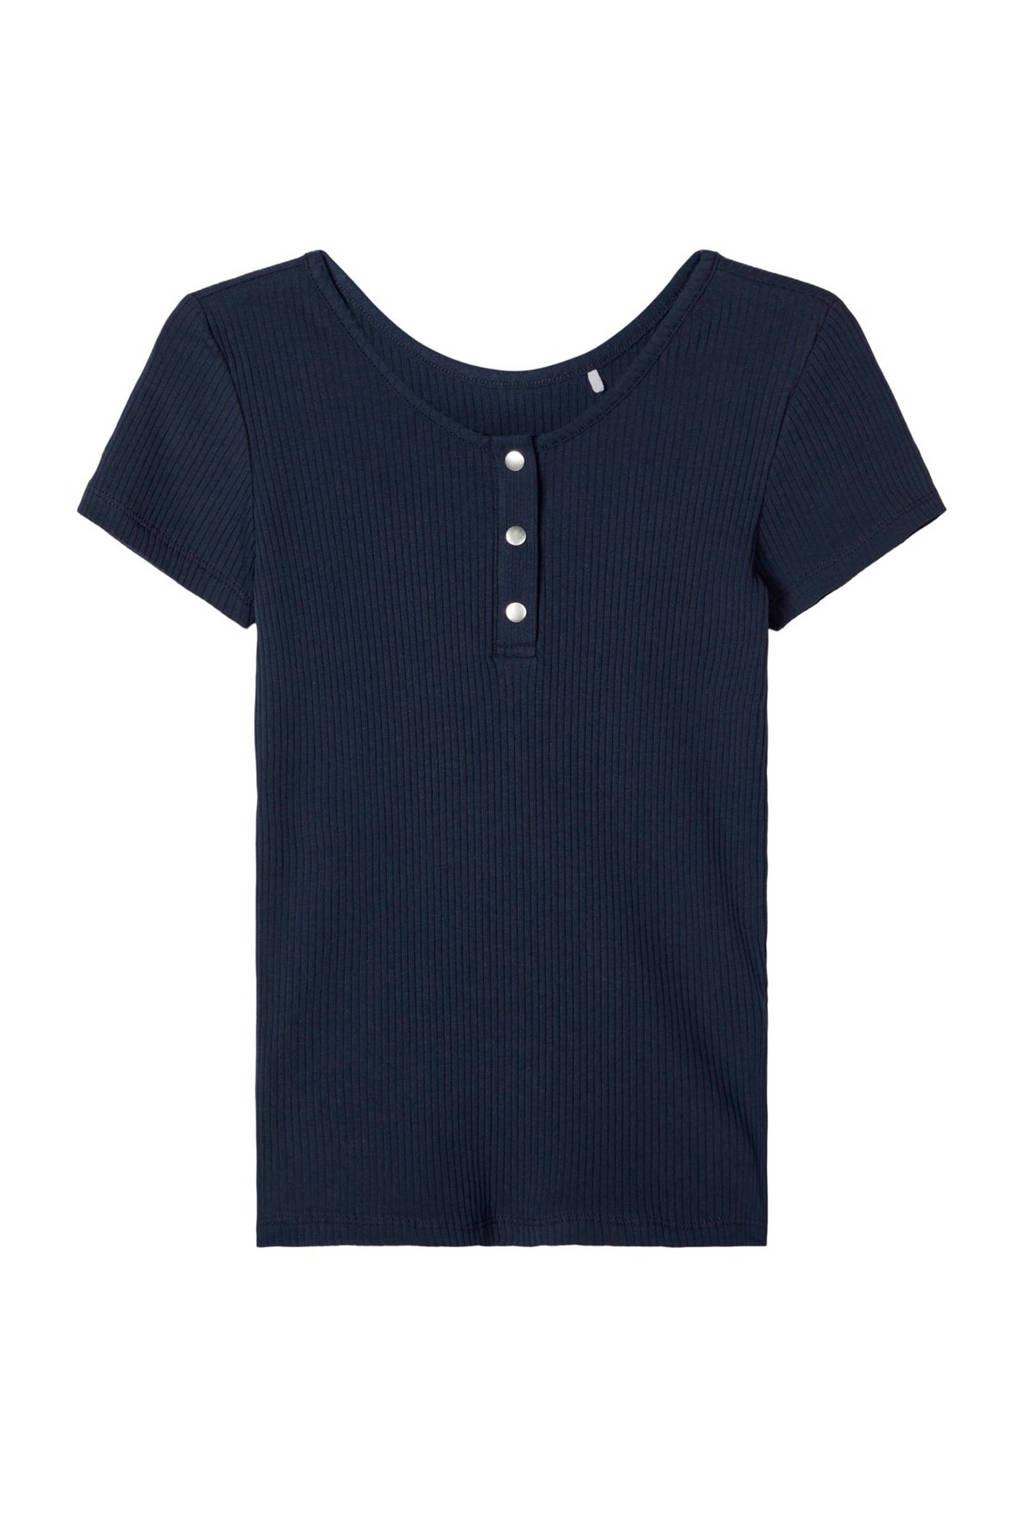 NAME IT KIDS T-shirt Flouri met biologisch katoen donkerblauw, Donkerblauw